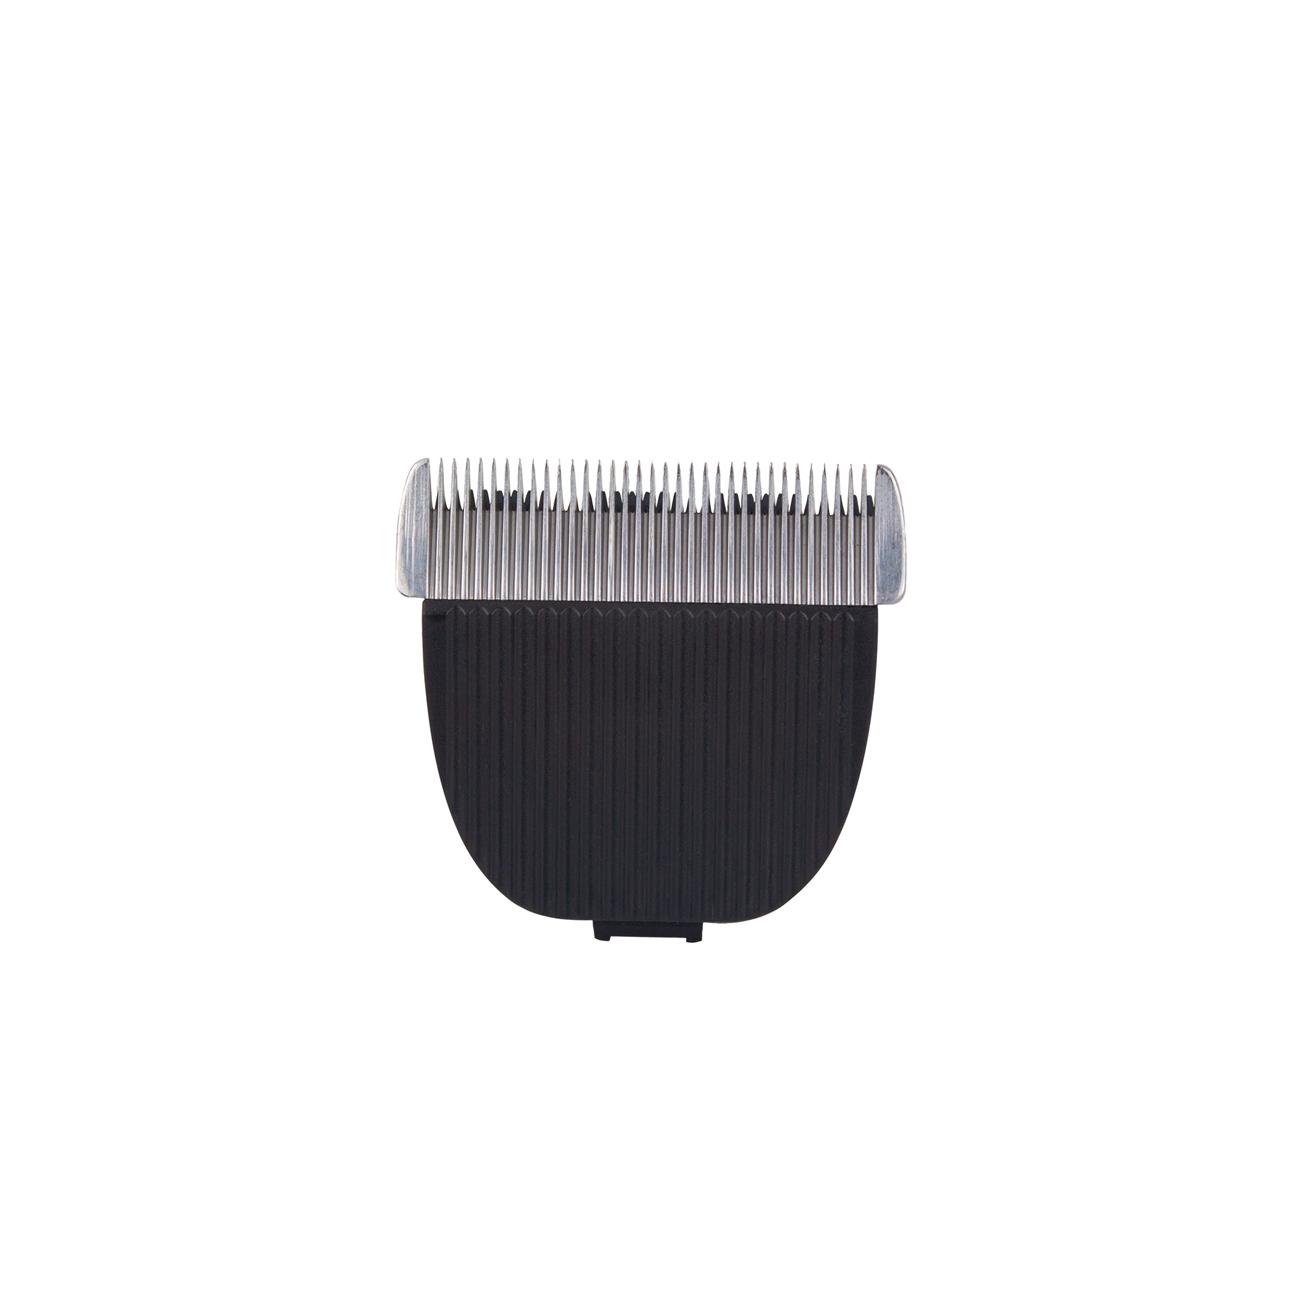 Lamina de tosa PRO6 Ultra Slim regulável da Nº10 a Nº40 Propetz (1,5mm a 0,25mm)